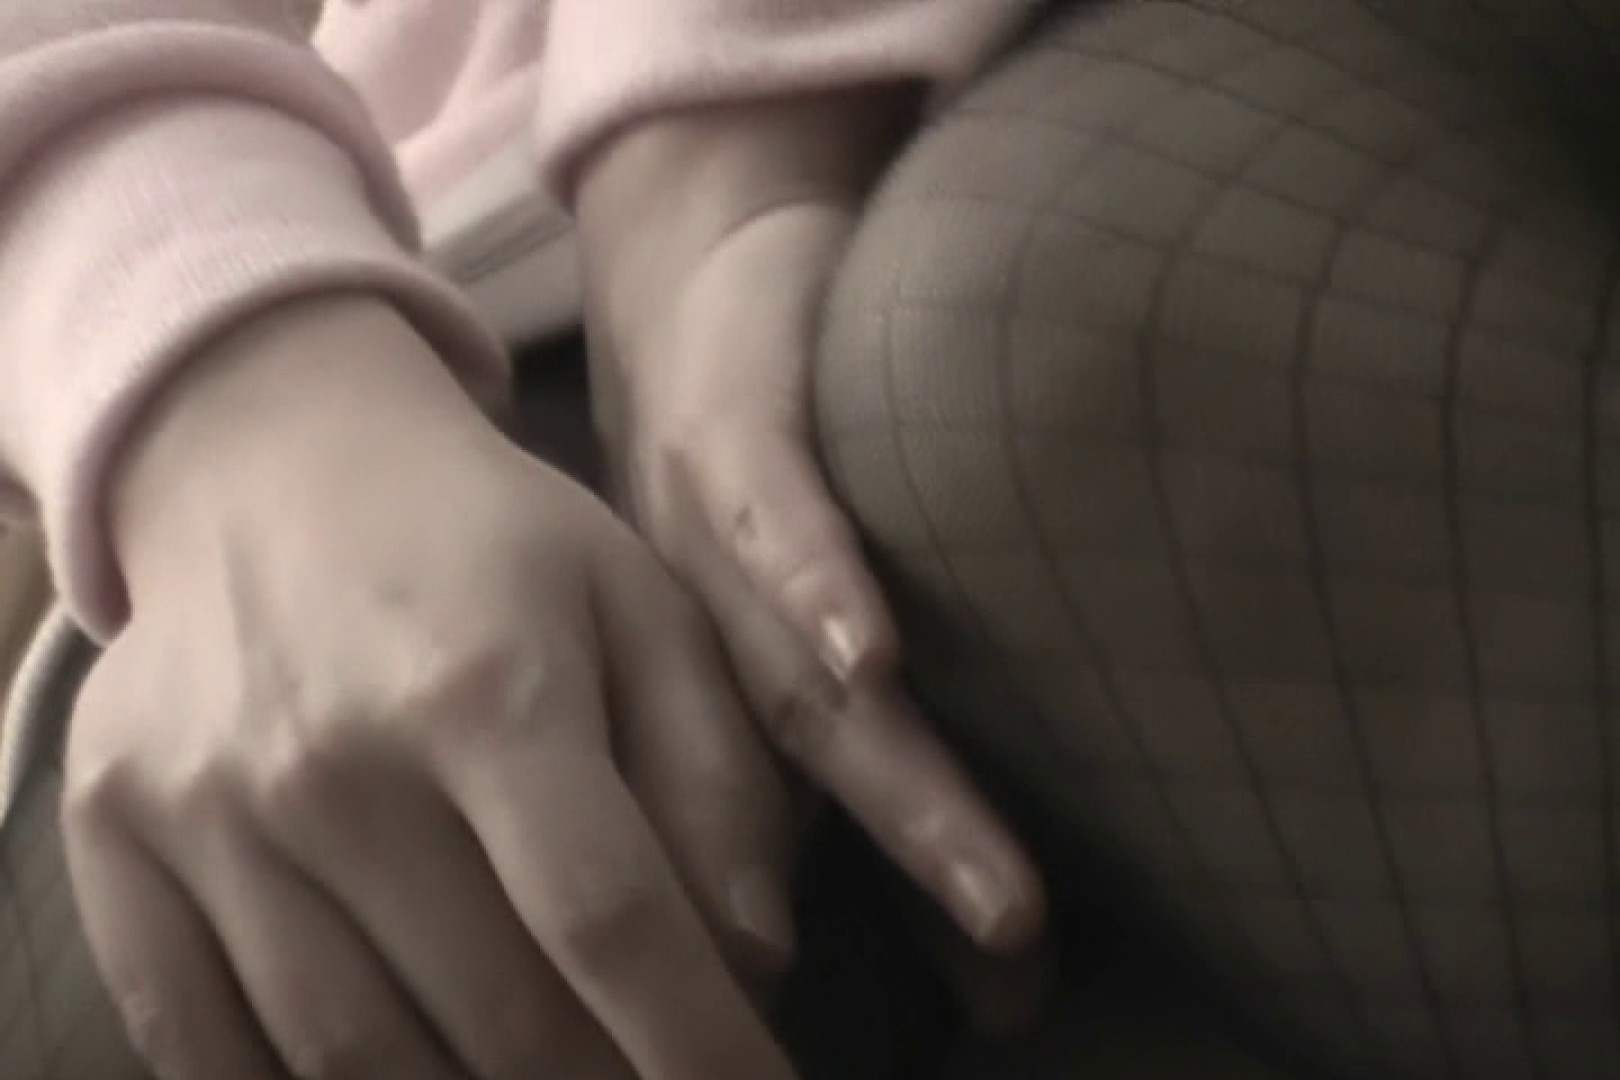 Hするために生まれてきたようなイキまくりの極エロ人妻~小池ゆり~ 熟女  108連発 47